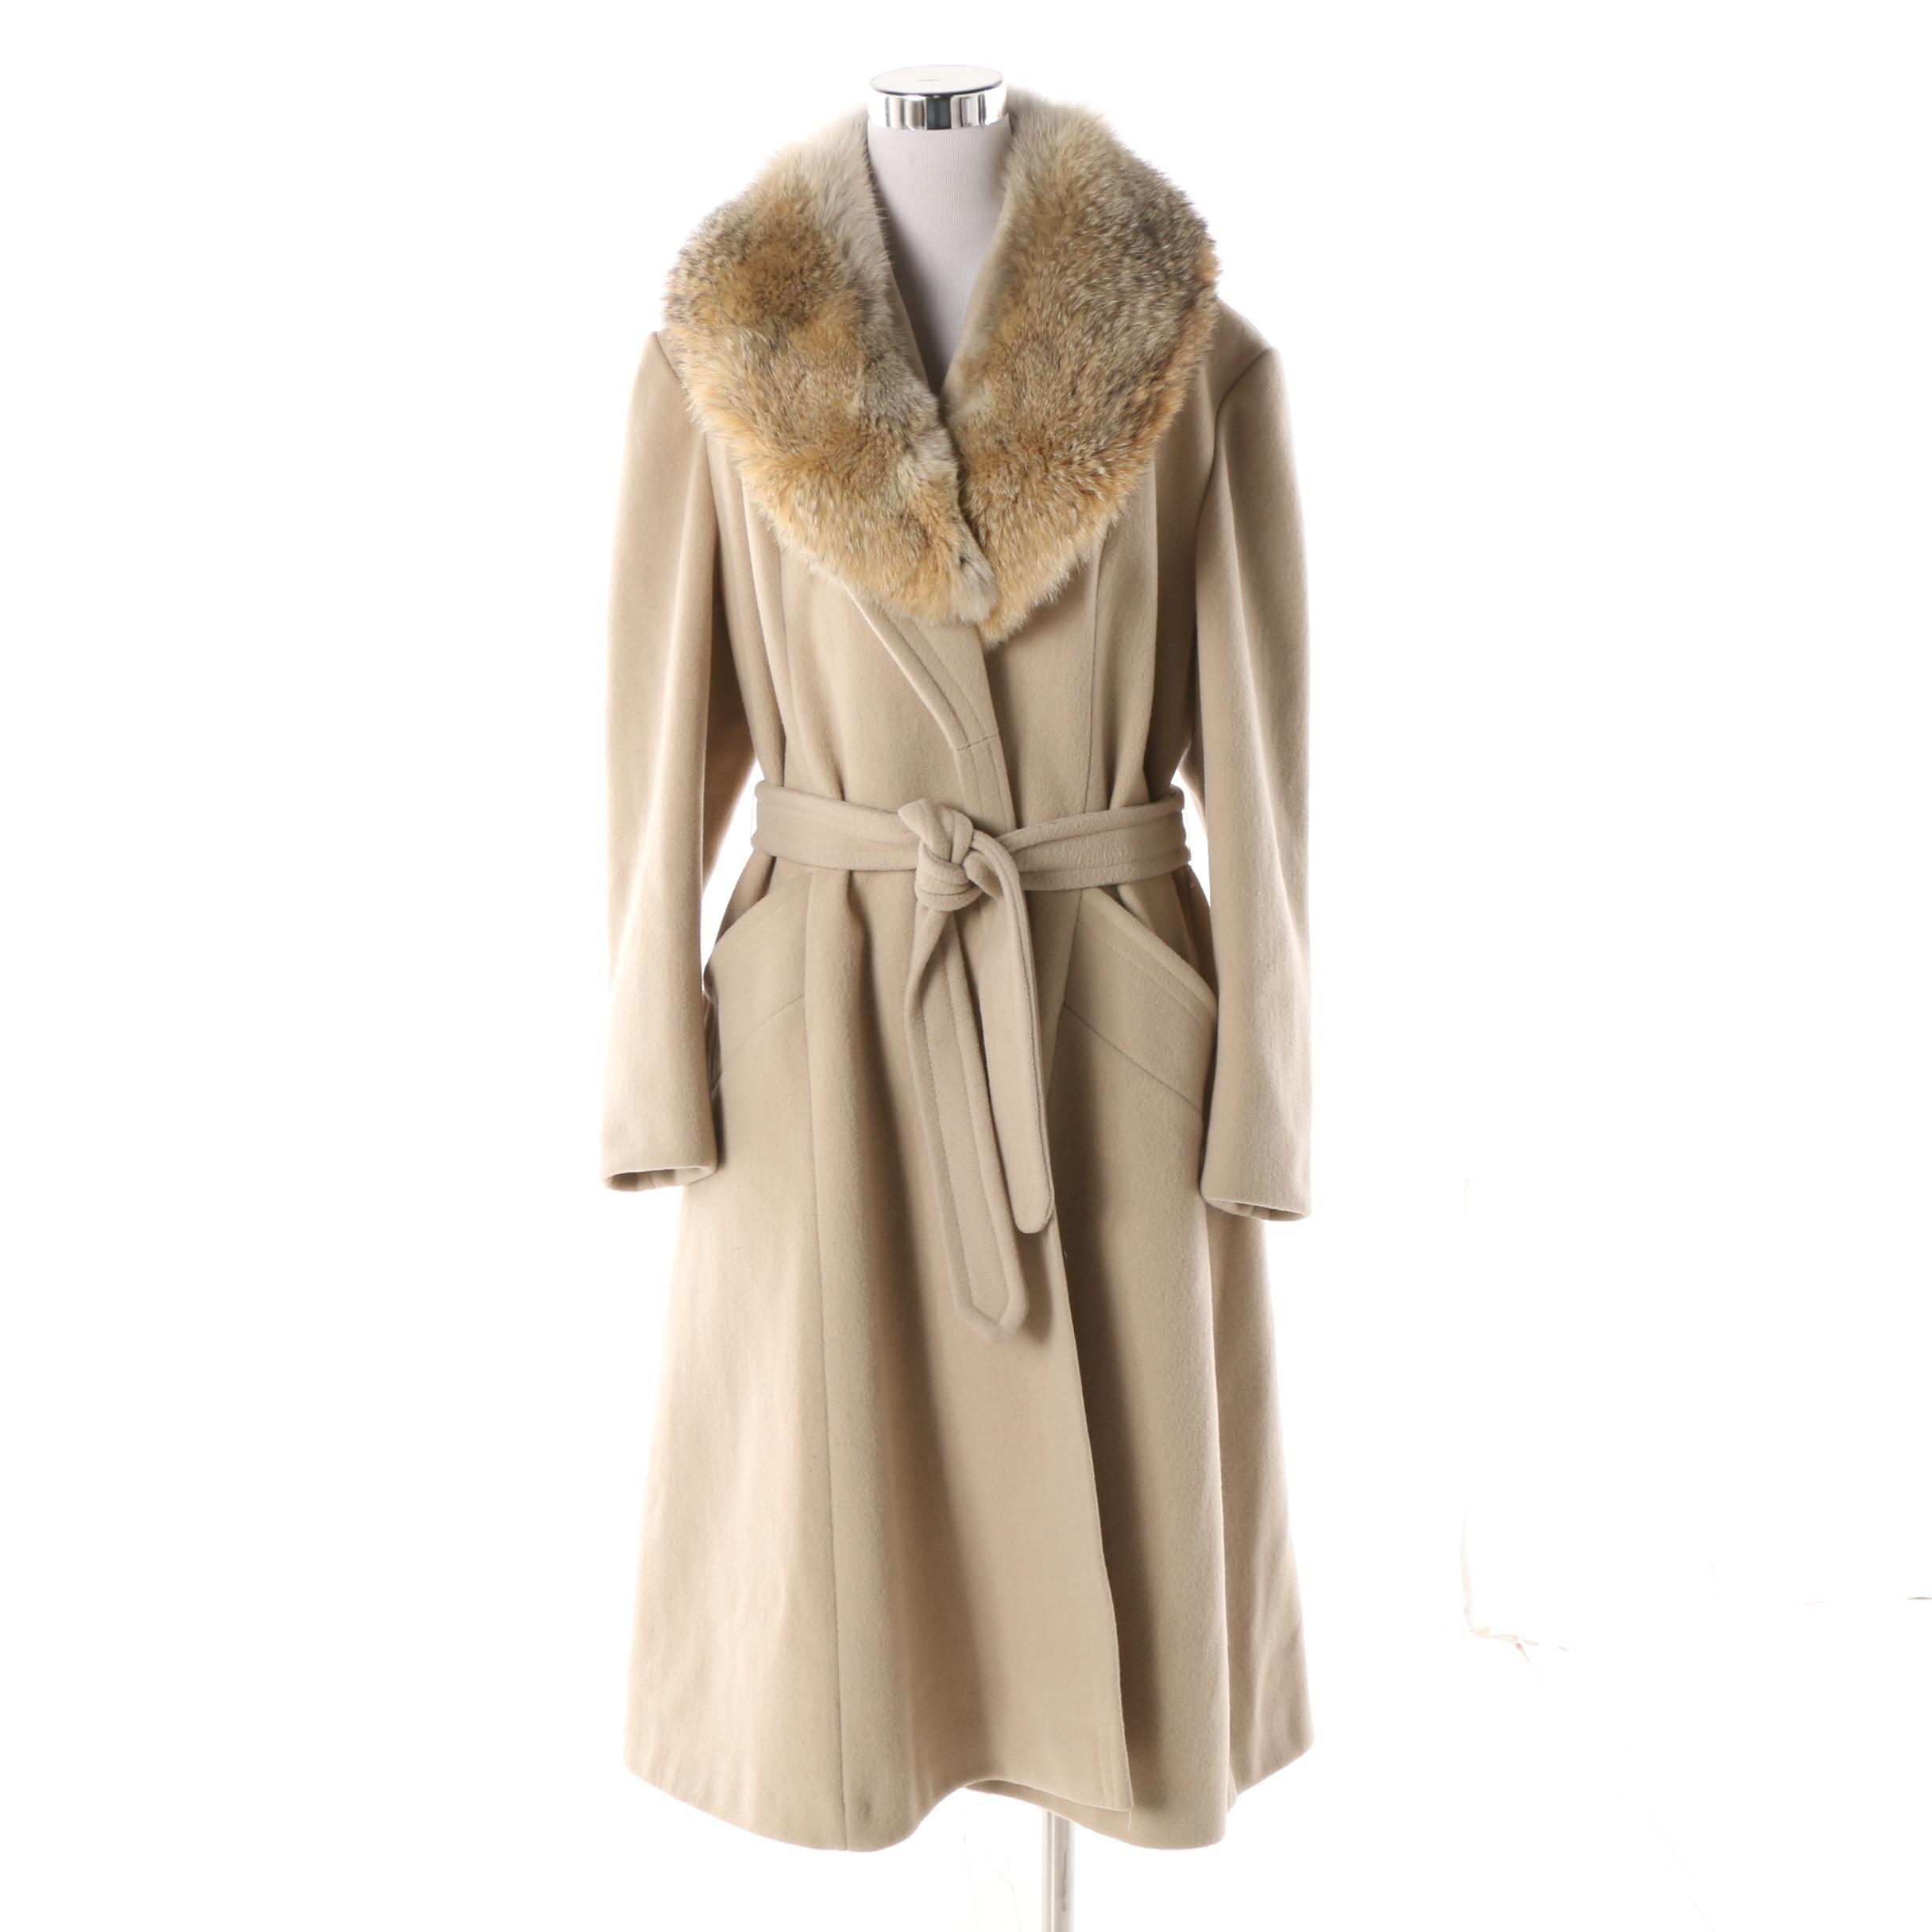 Women's Vintage Alorna Beige Wool Blend Coat with Coyote Fur Collar